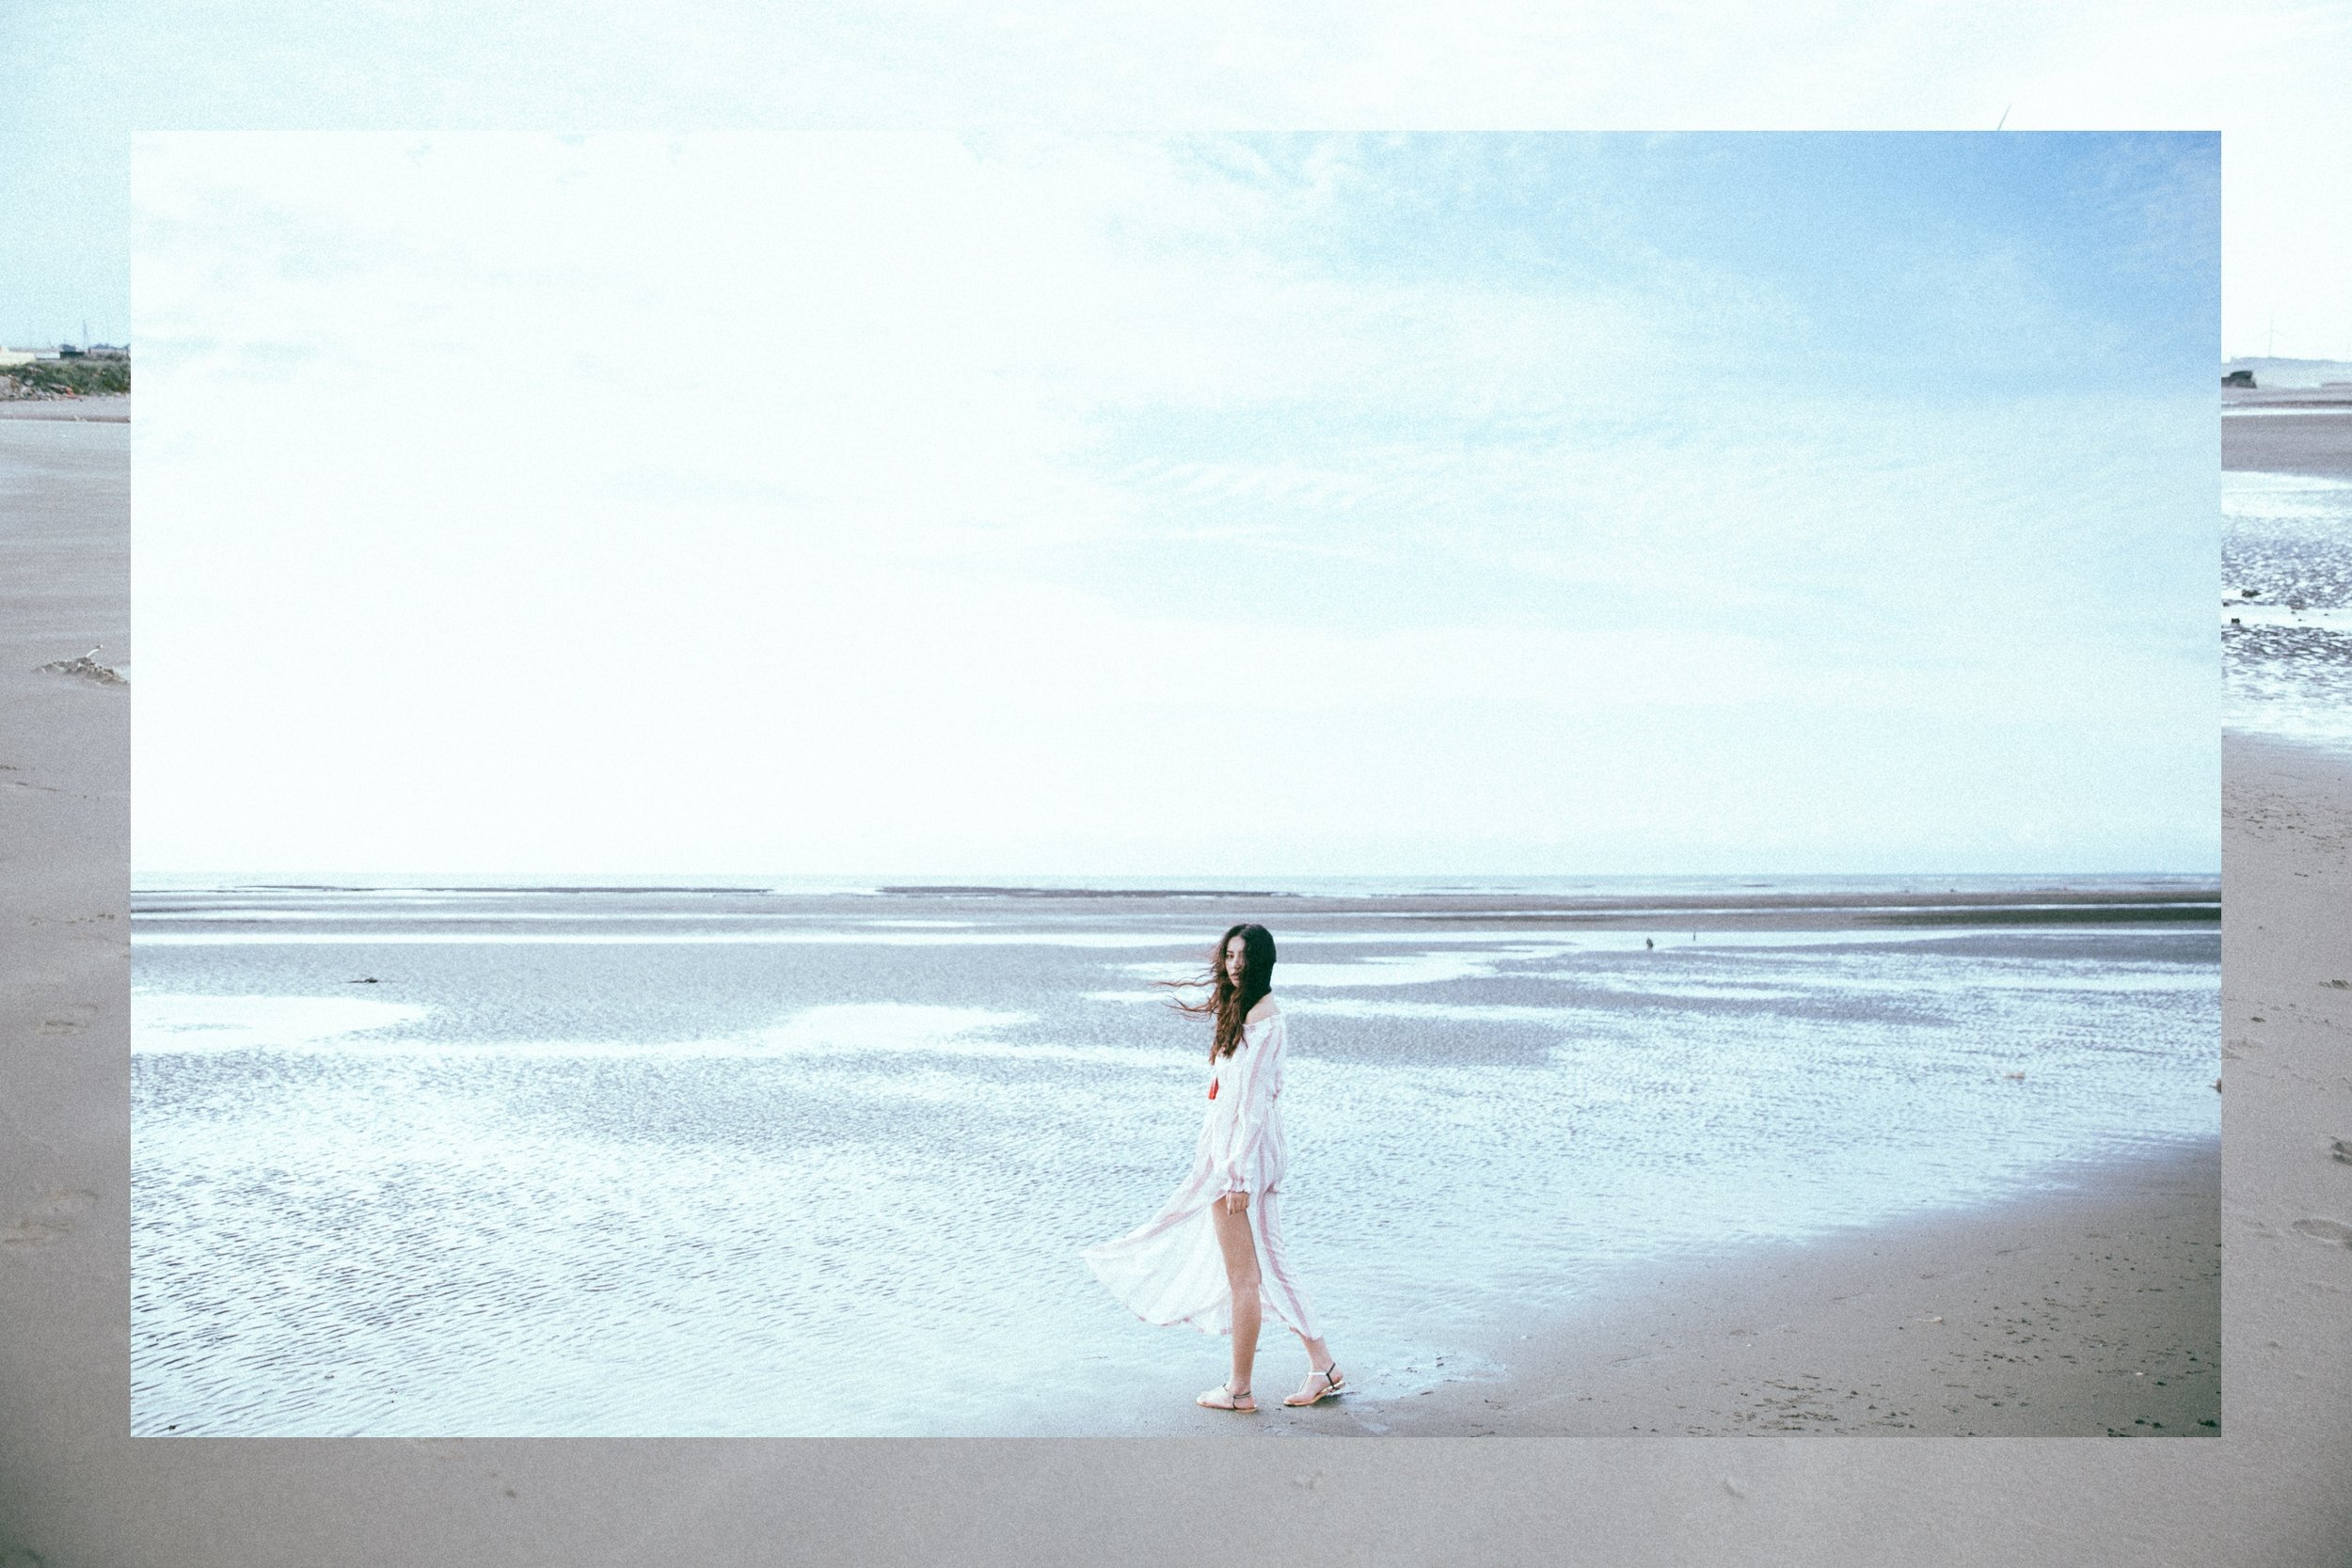 portrait-jane-girl-寫真-許厝港-桃園-22.jpg